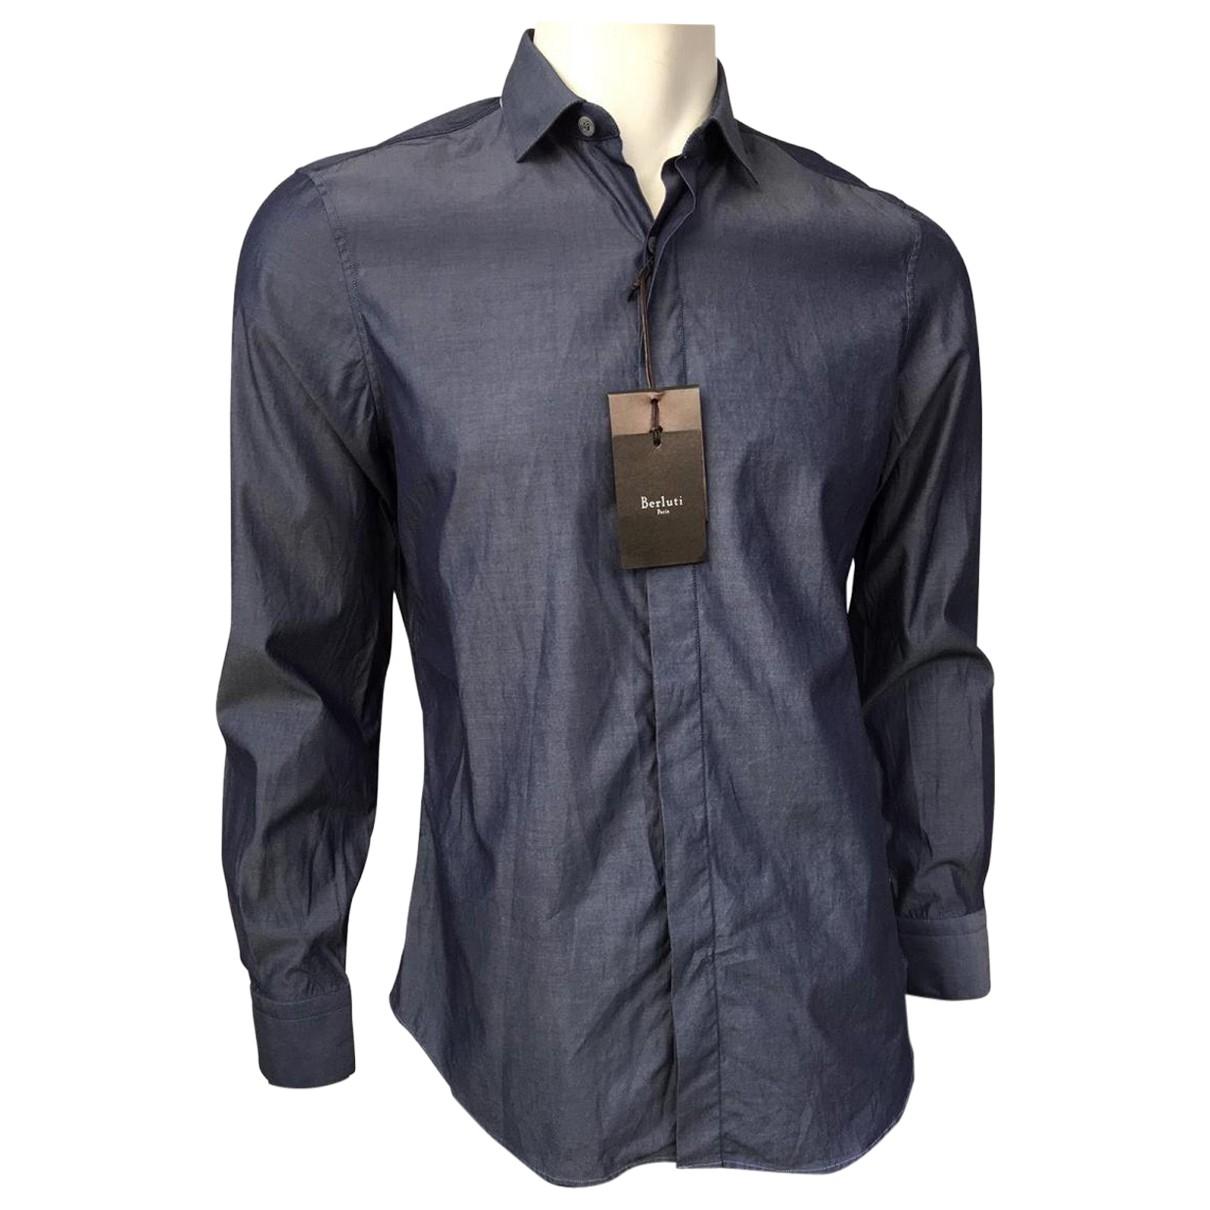 Berluti \N Navy Cotton Shirts for Men 15.5 UK - US (tour de cou / collar)